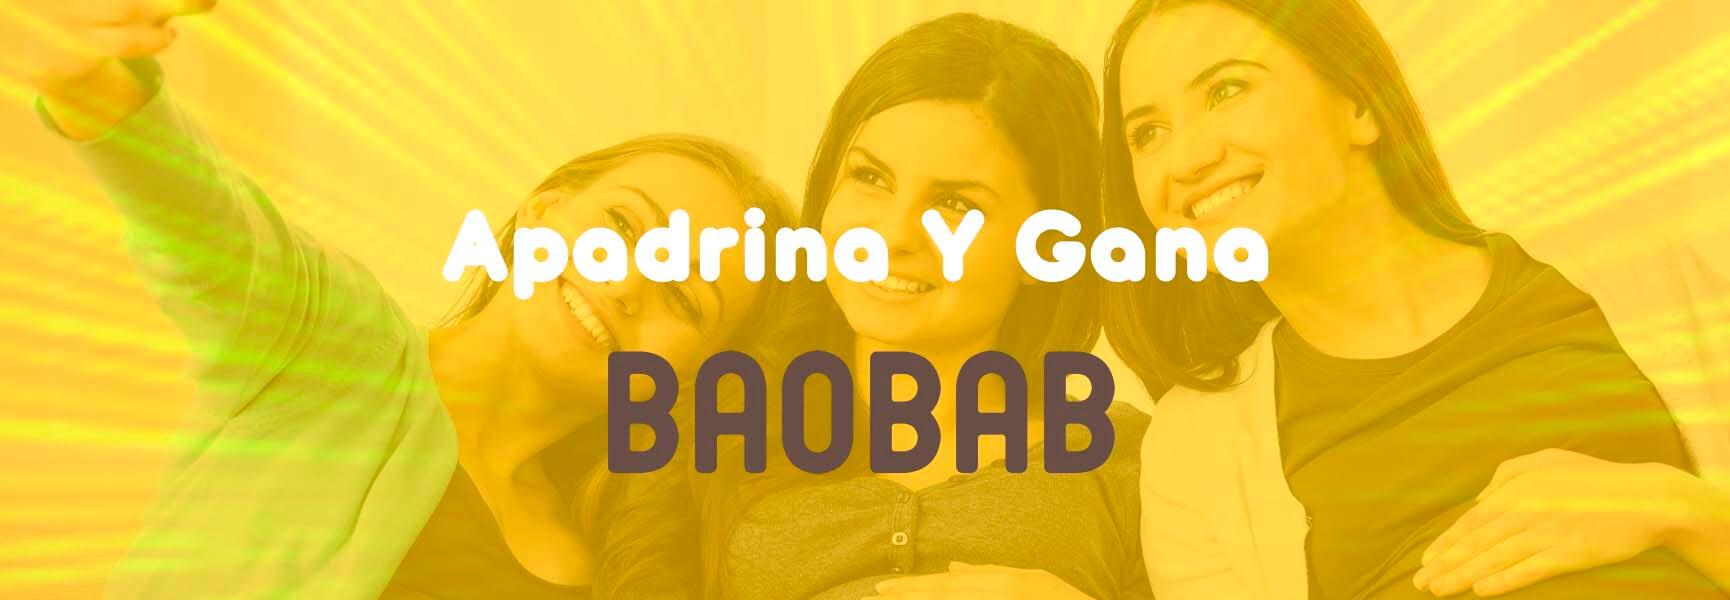 Apadrina Y Gana Bebe | Le petit BAOBAB